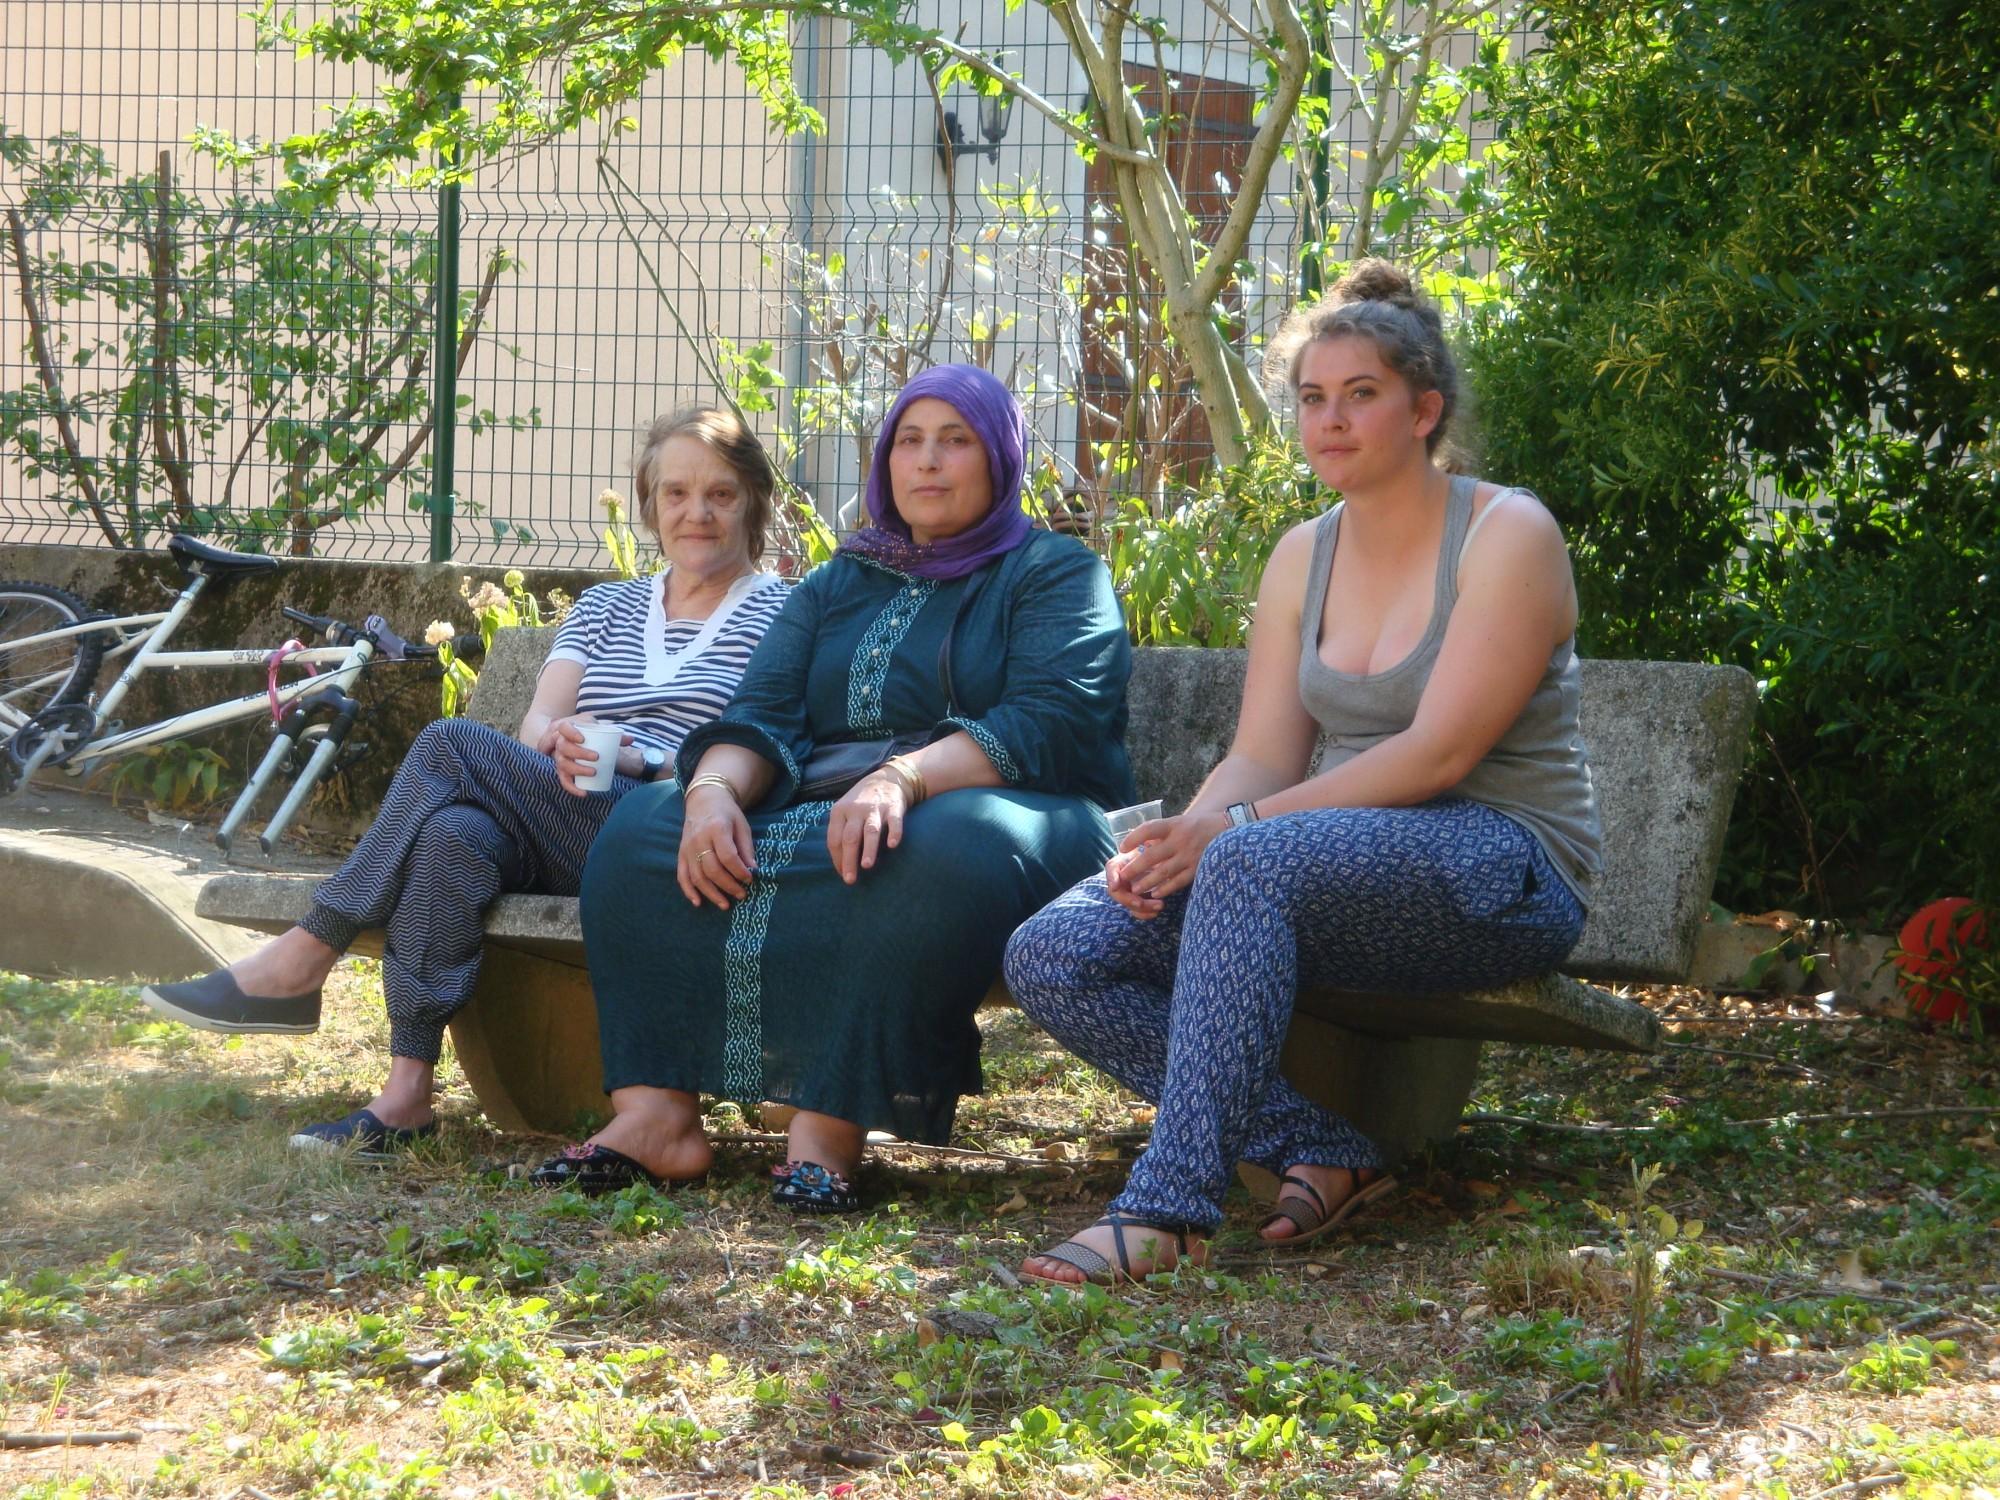 Fete_des_voisins_Residence_Mulhouse_29-05-15__15_